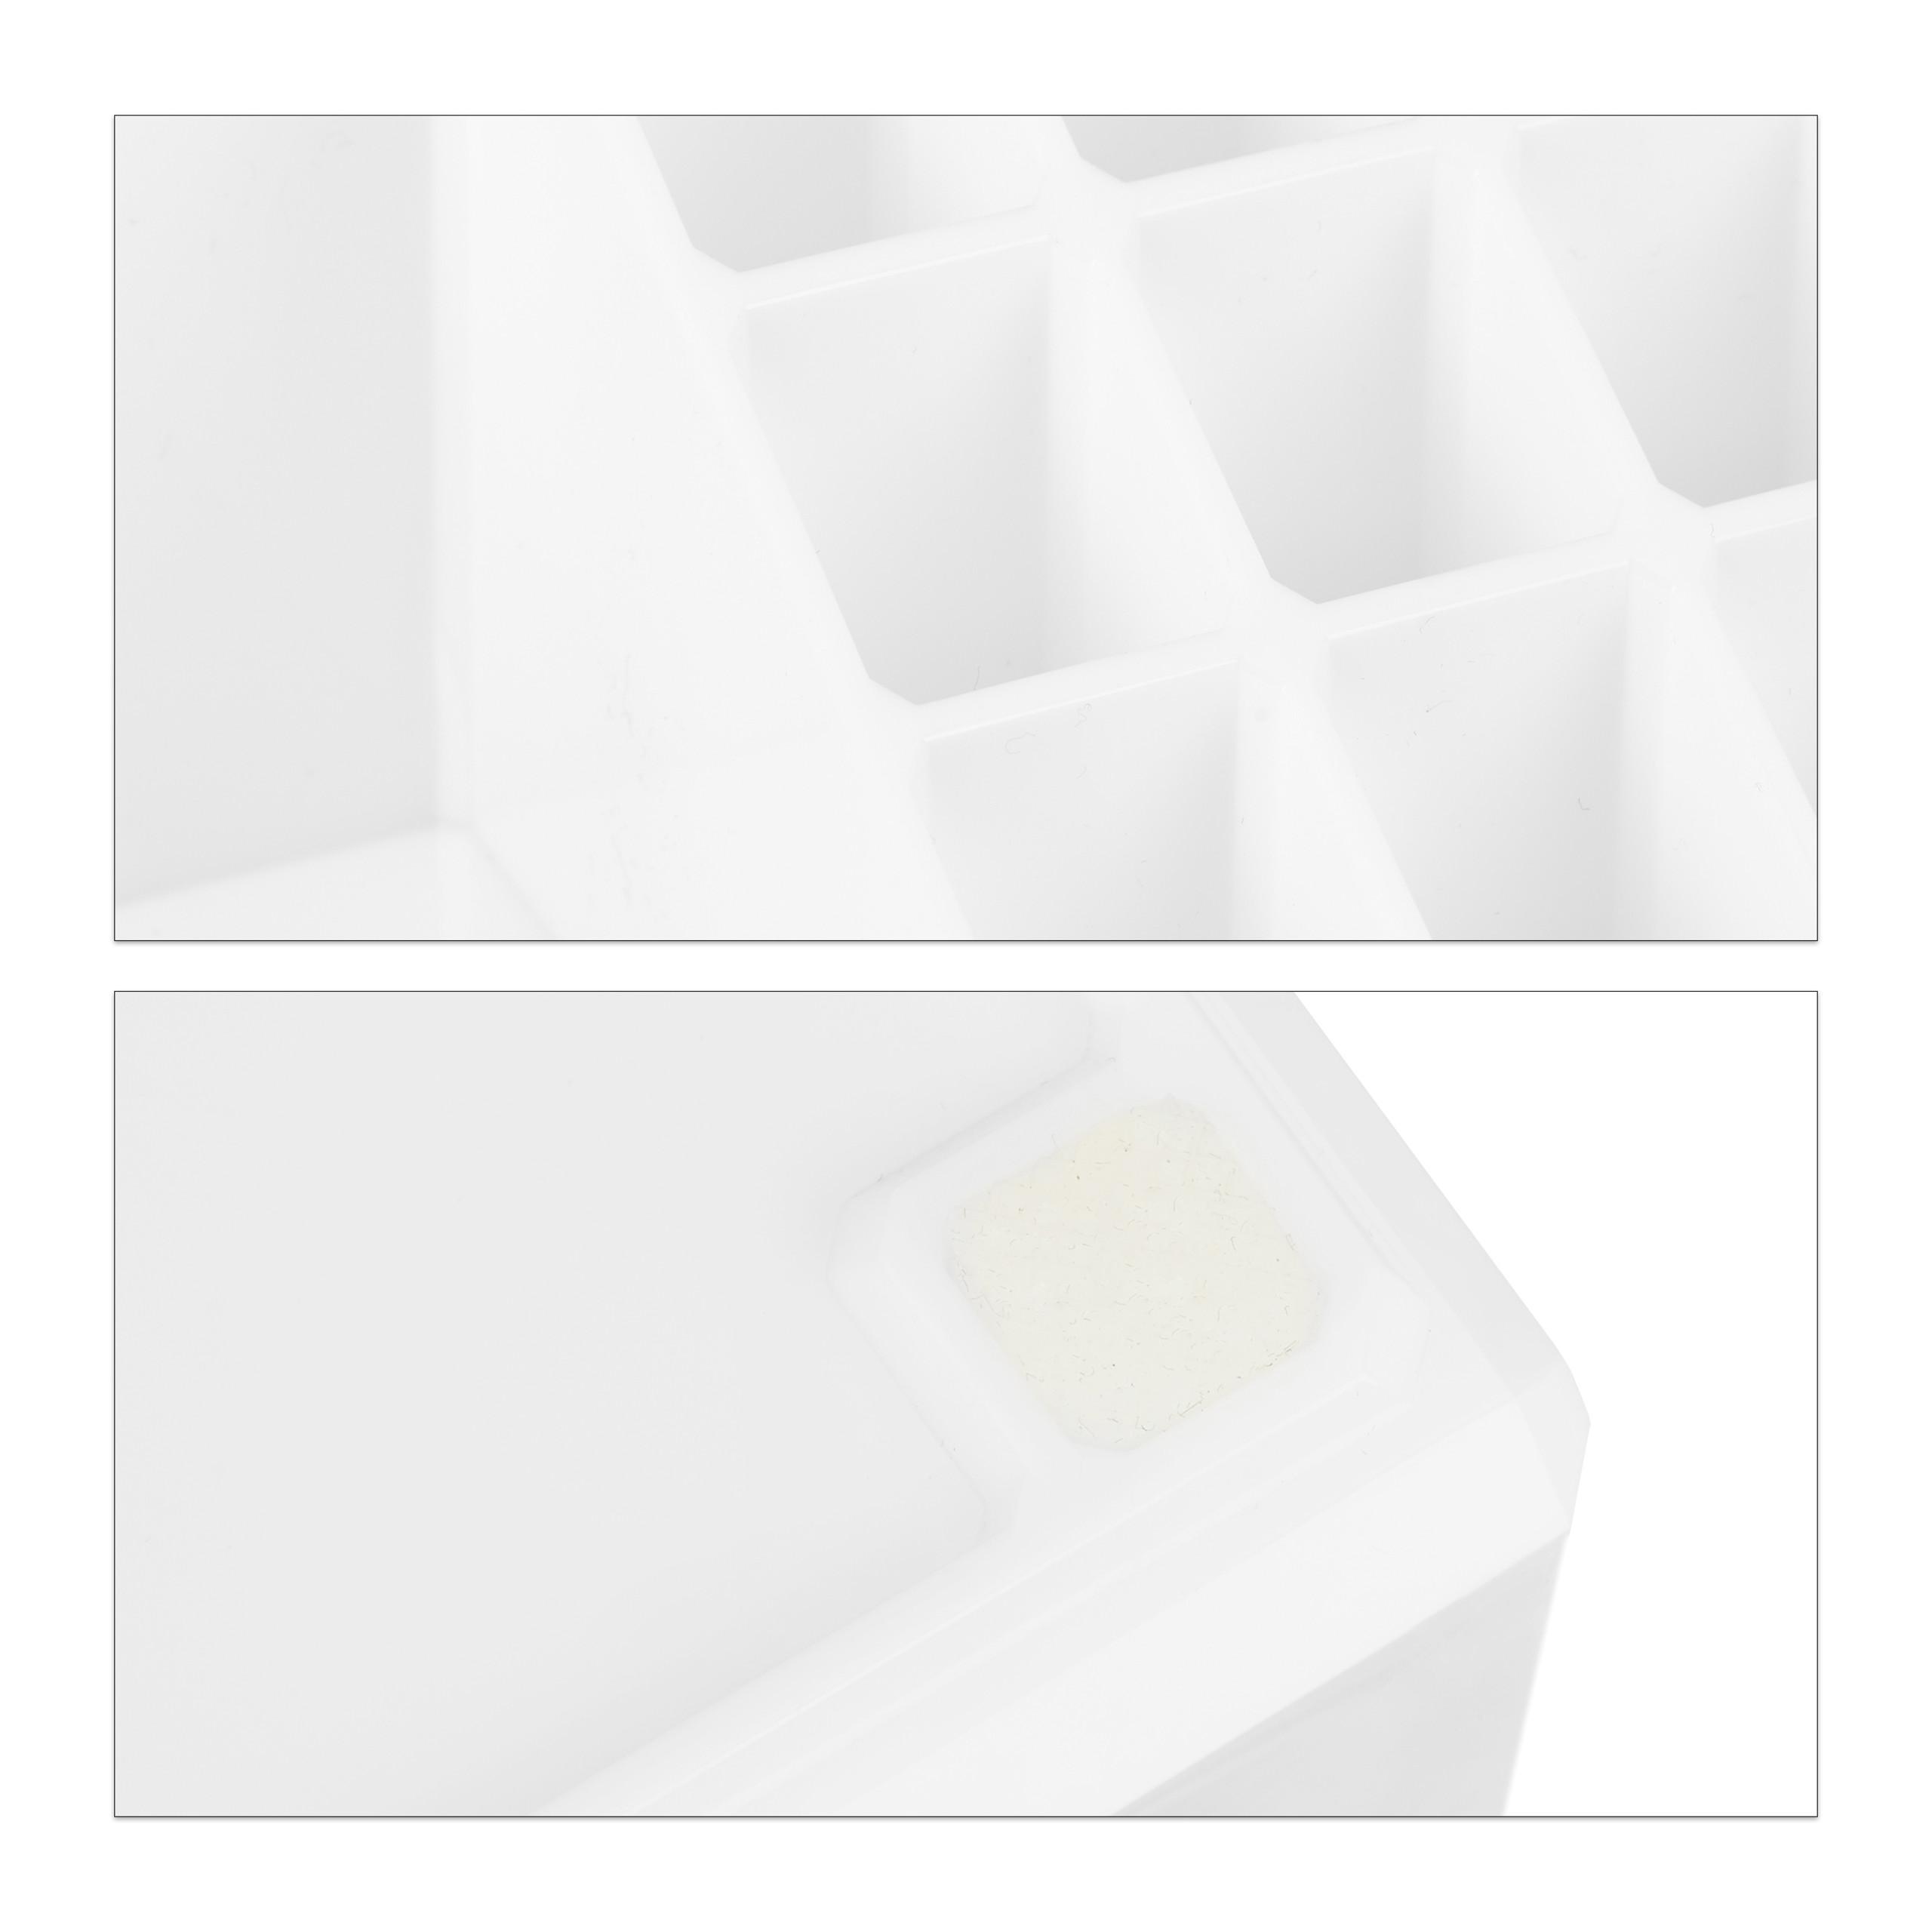 make-up-organizer-opbergen-van-cosmetica-acryl-stapelbaar-met-lades miniatuur 27